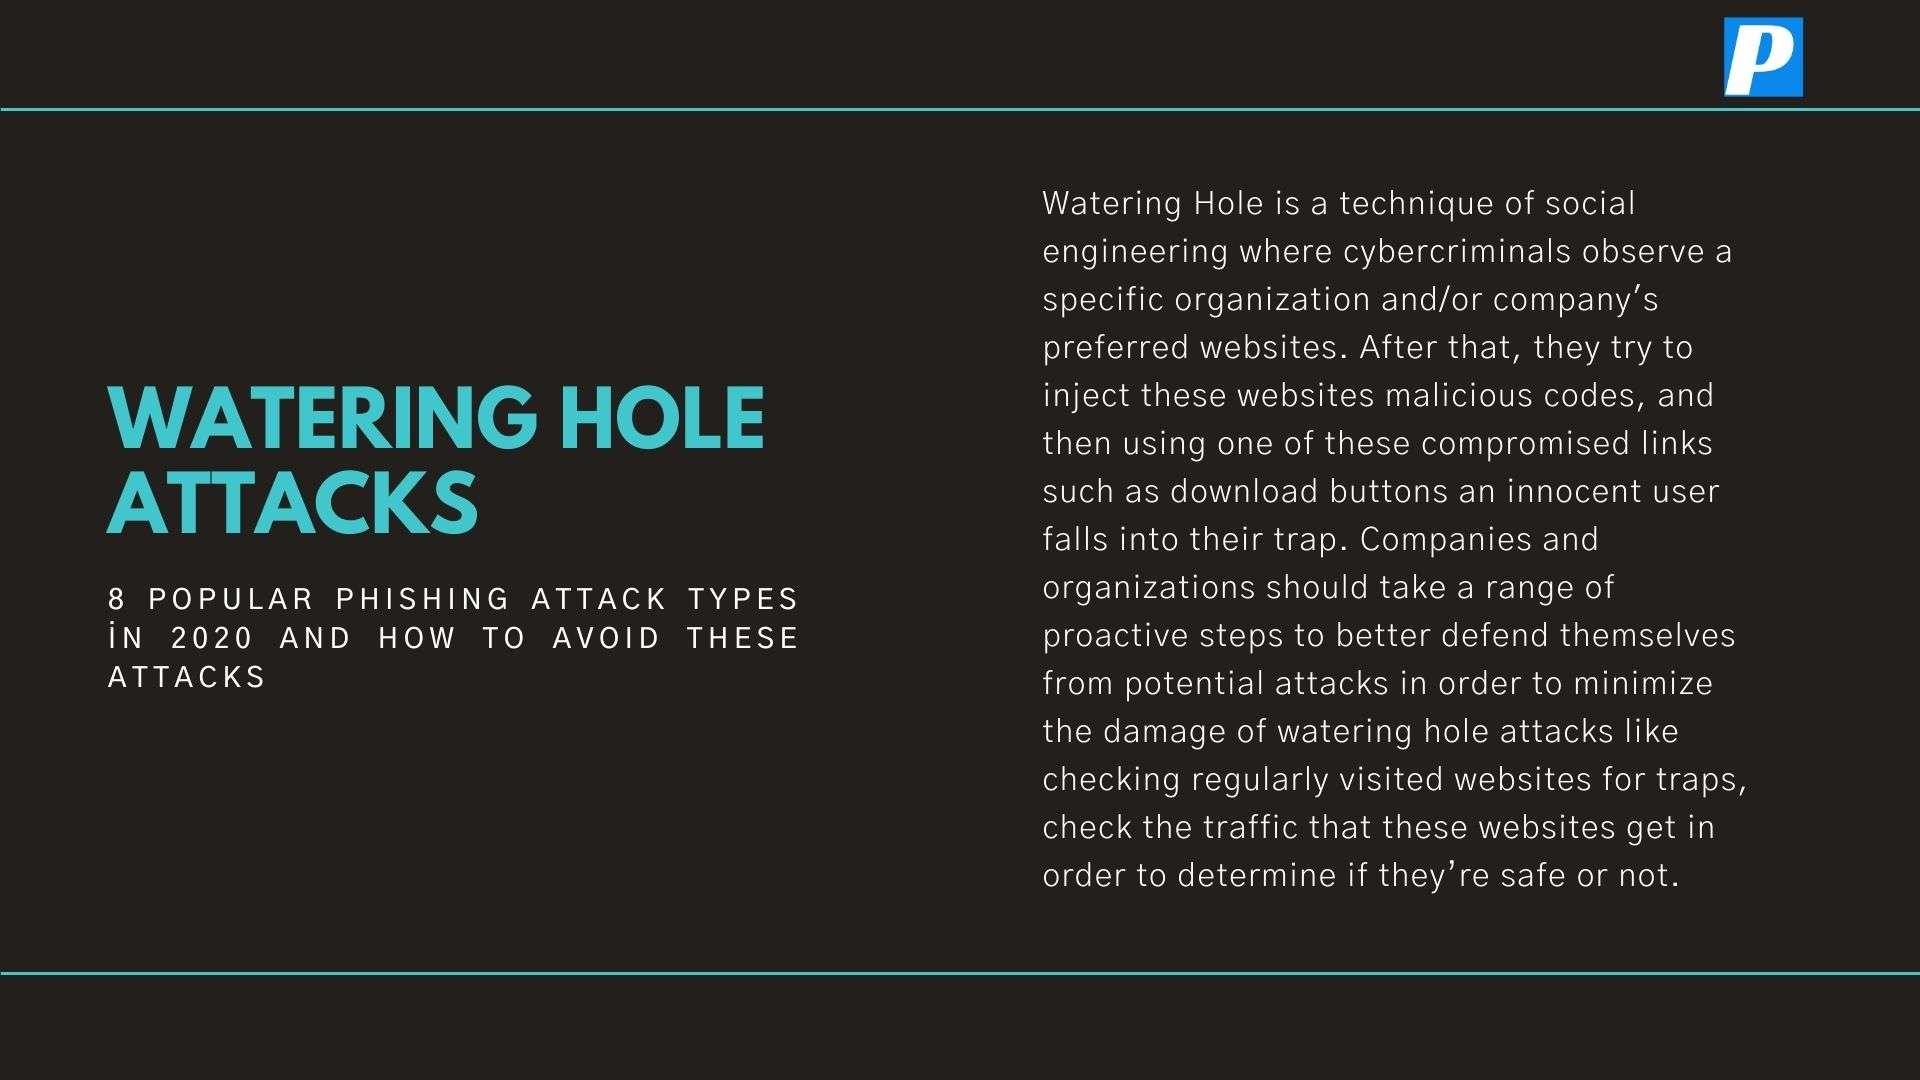 8 Popular Phishing Attack Types in 2020 3